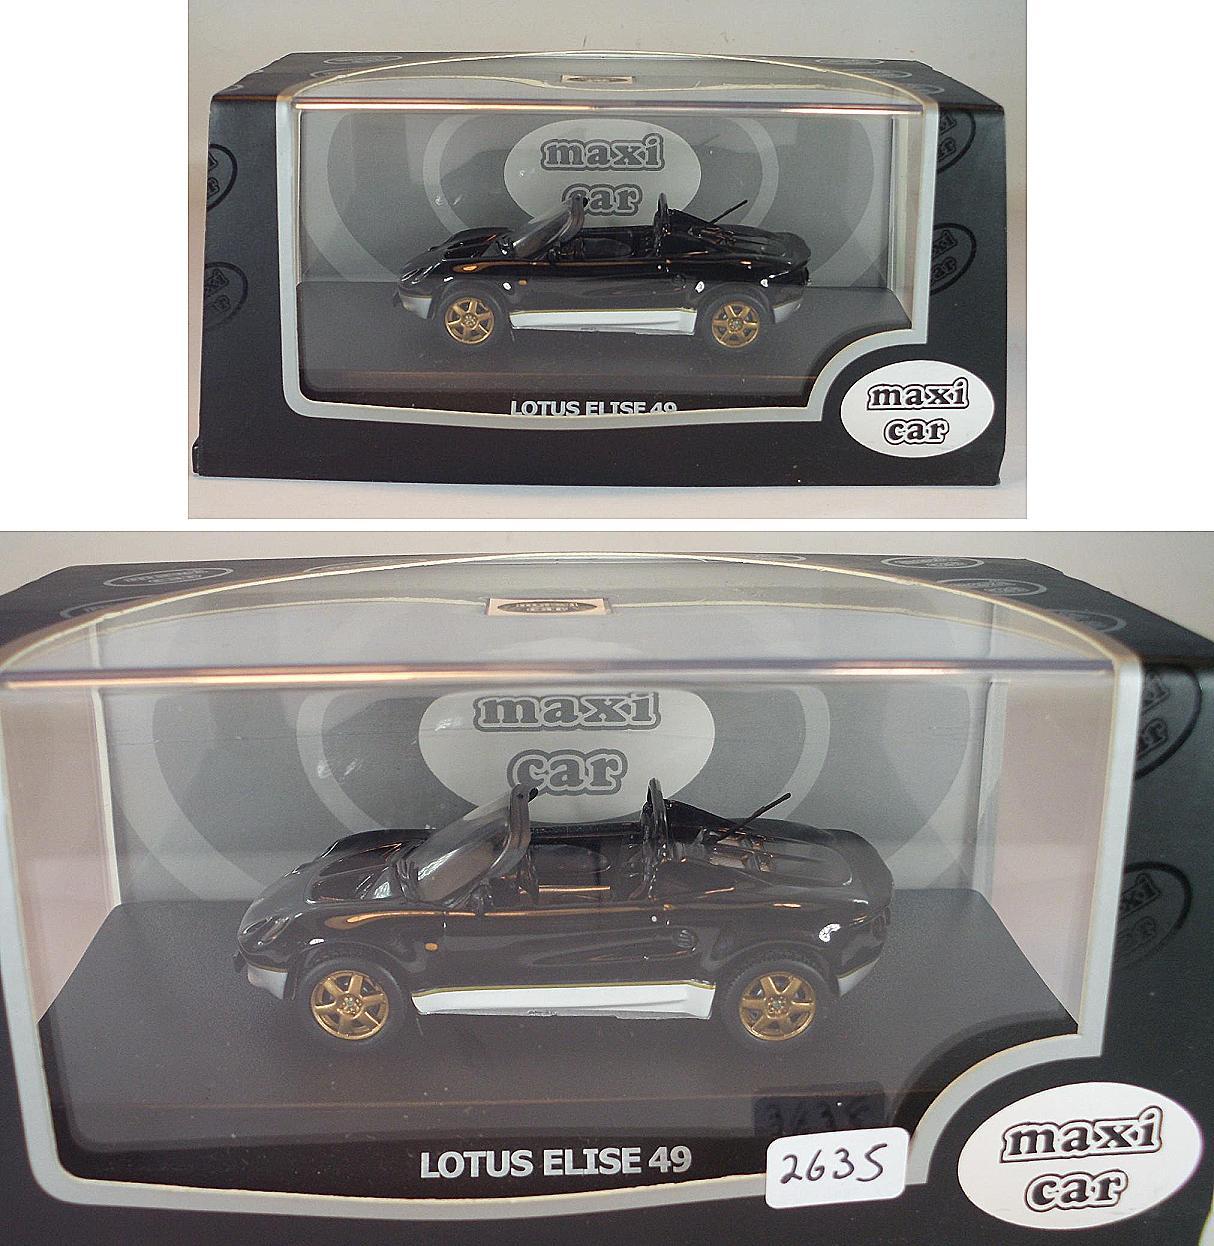 Lotus Elise 49 Gelb Mark i 1 Generation 1//43 Maxi Car Modell Auto Modellauto So